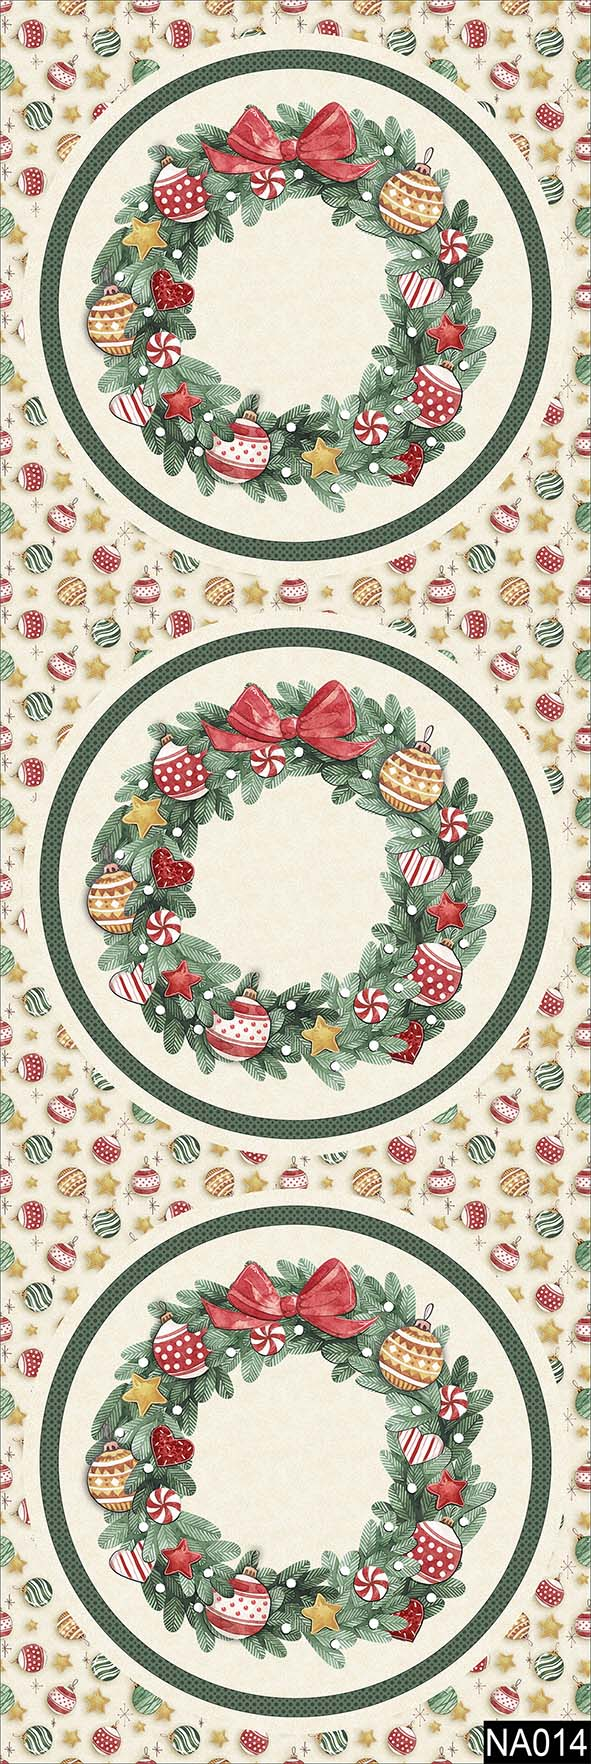 Sousplat Guirlanda Natal  - Tecidos Digitais